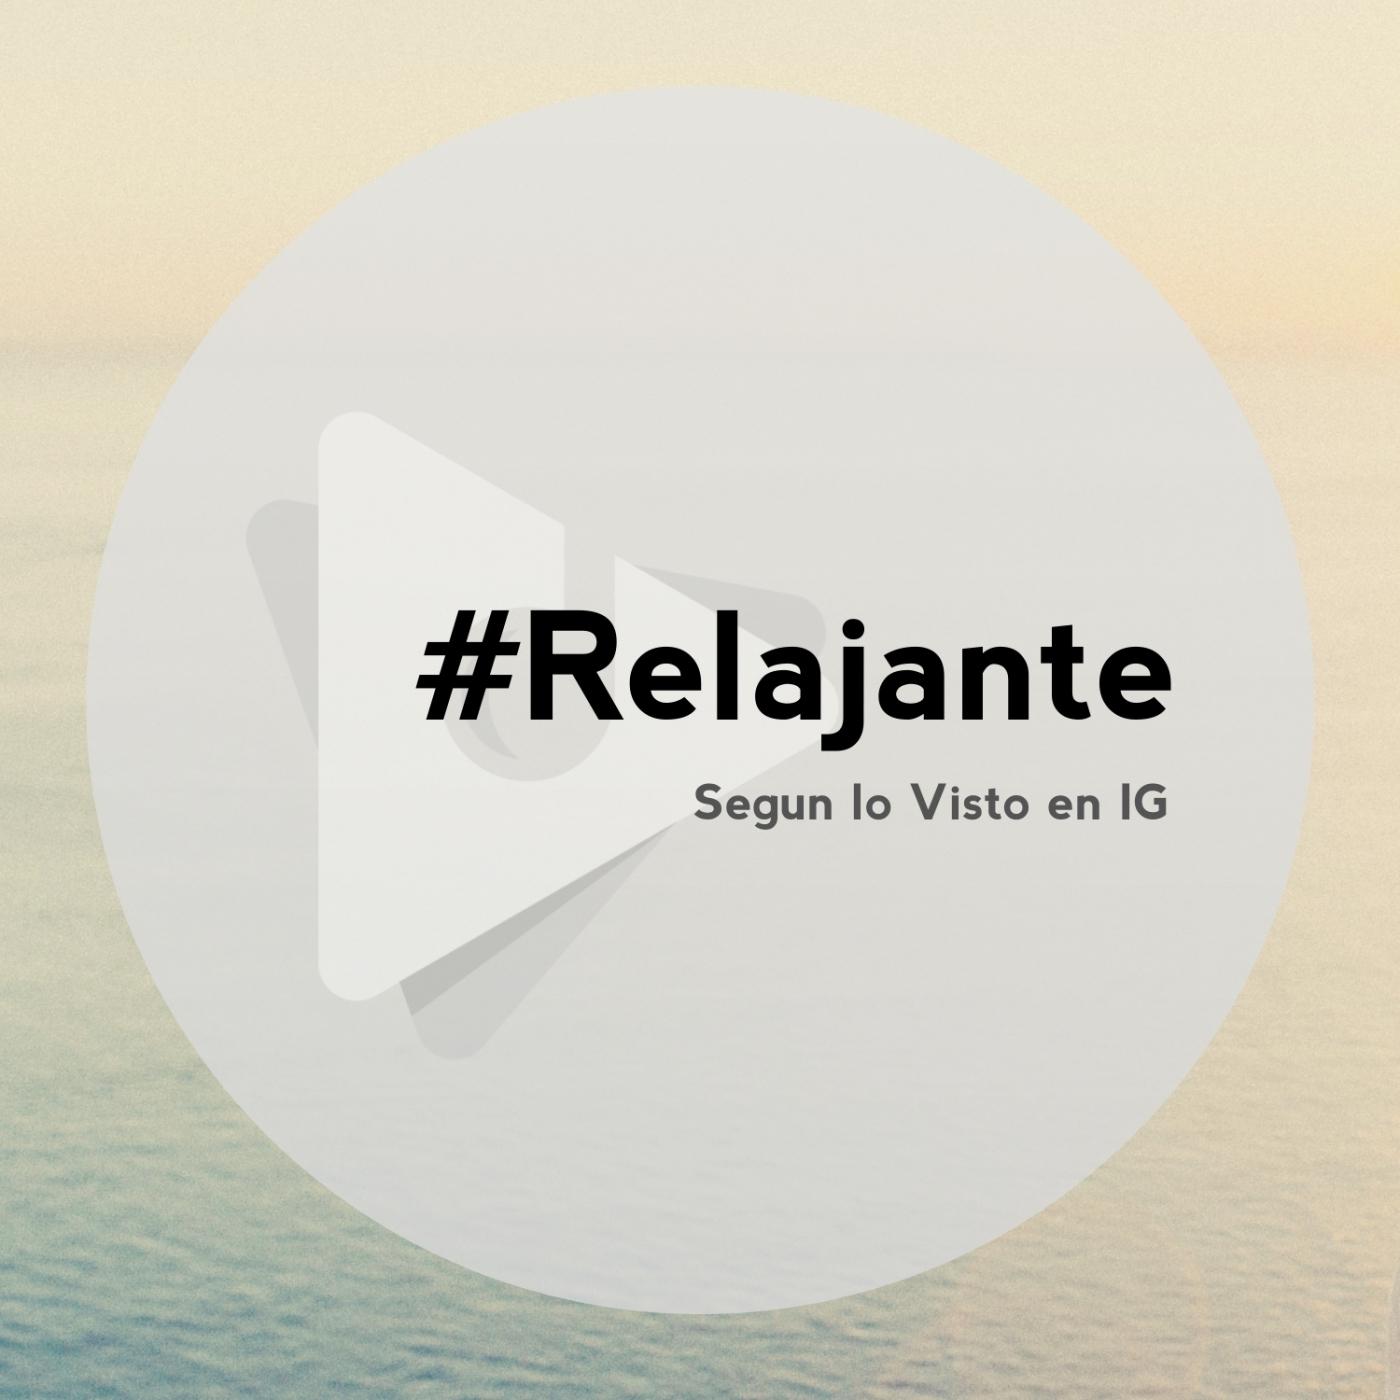 #Relajante